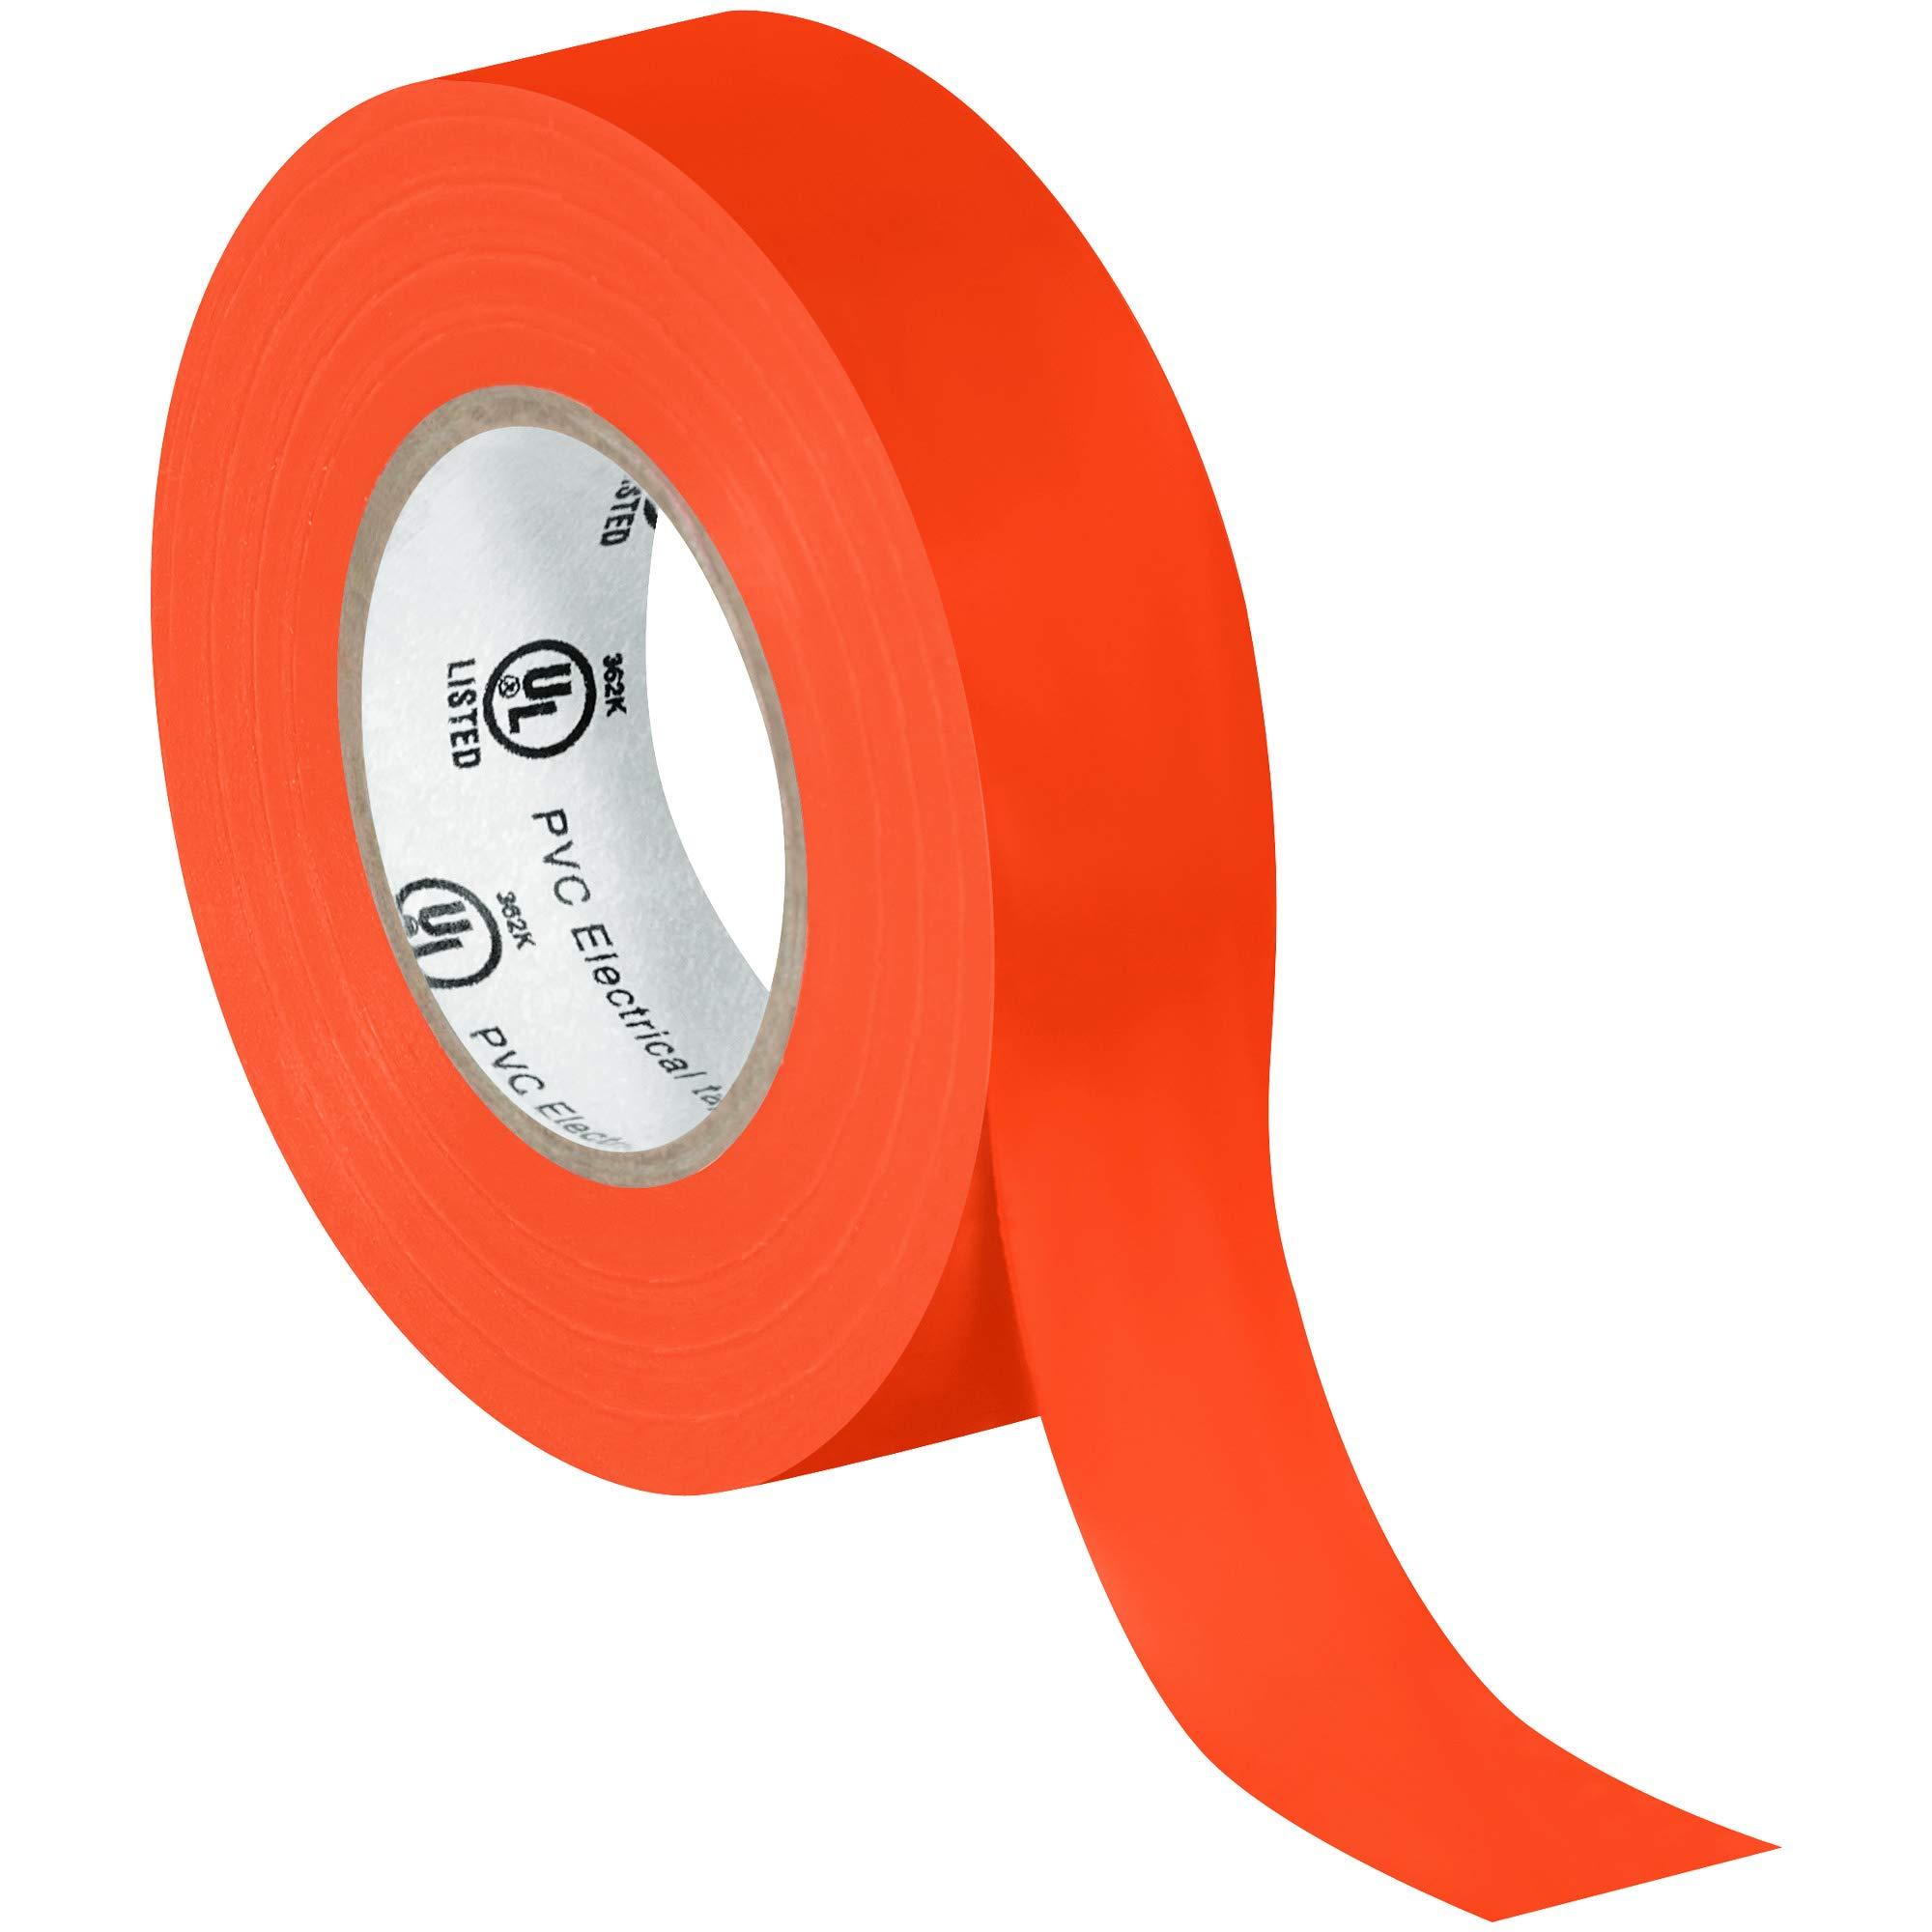 Electrical Tape, 7.0 Mil, 3/4''x 20 yds, Orange, 200/Case